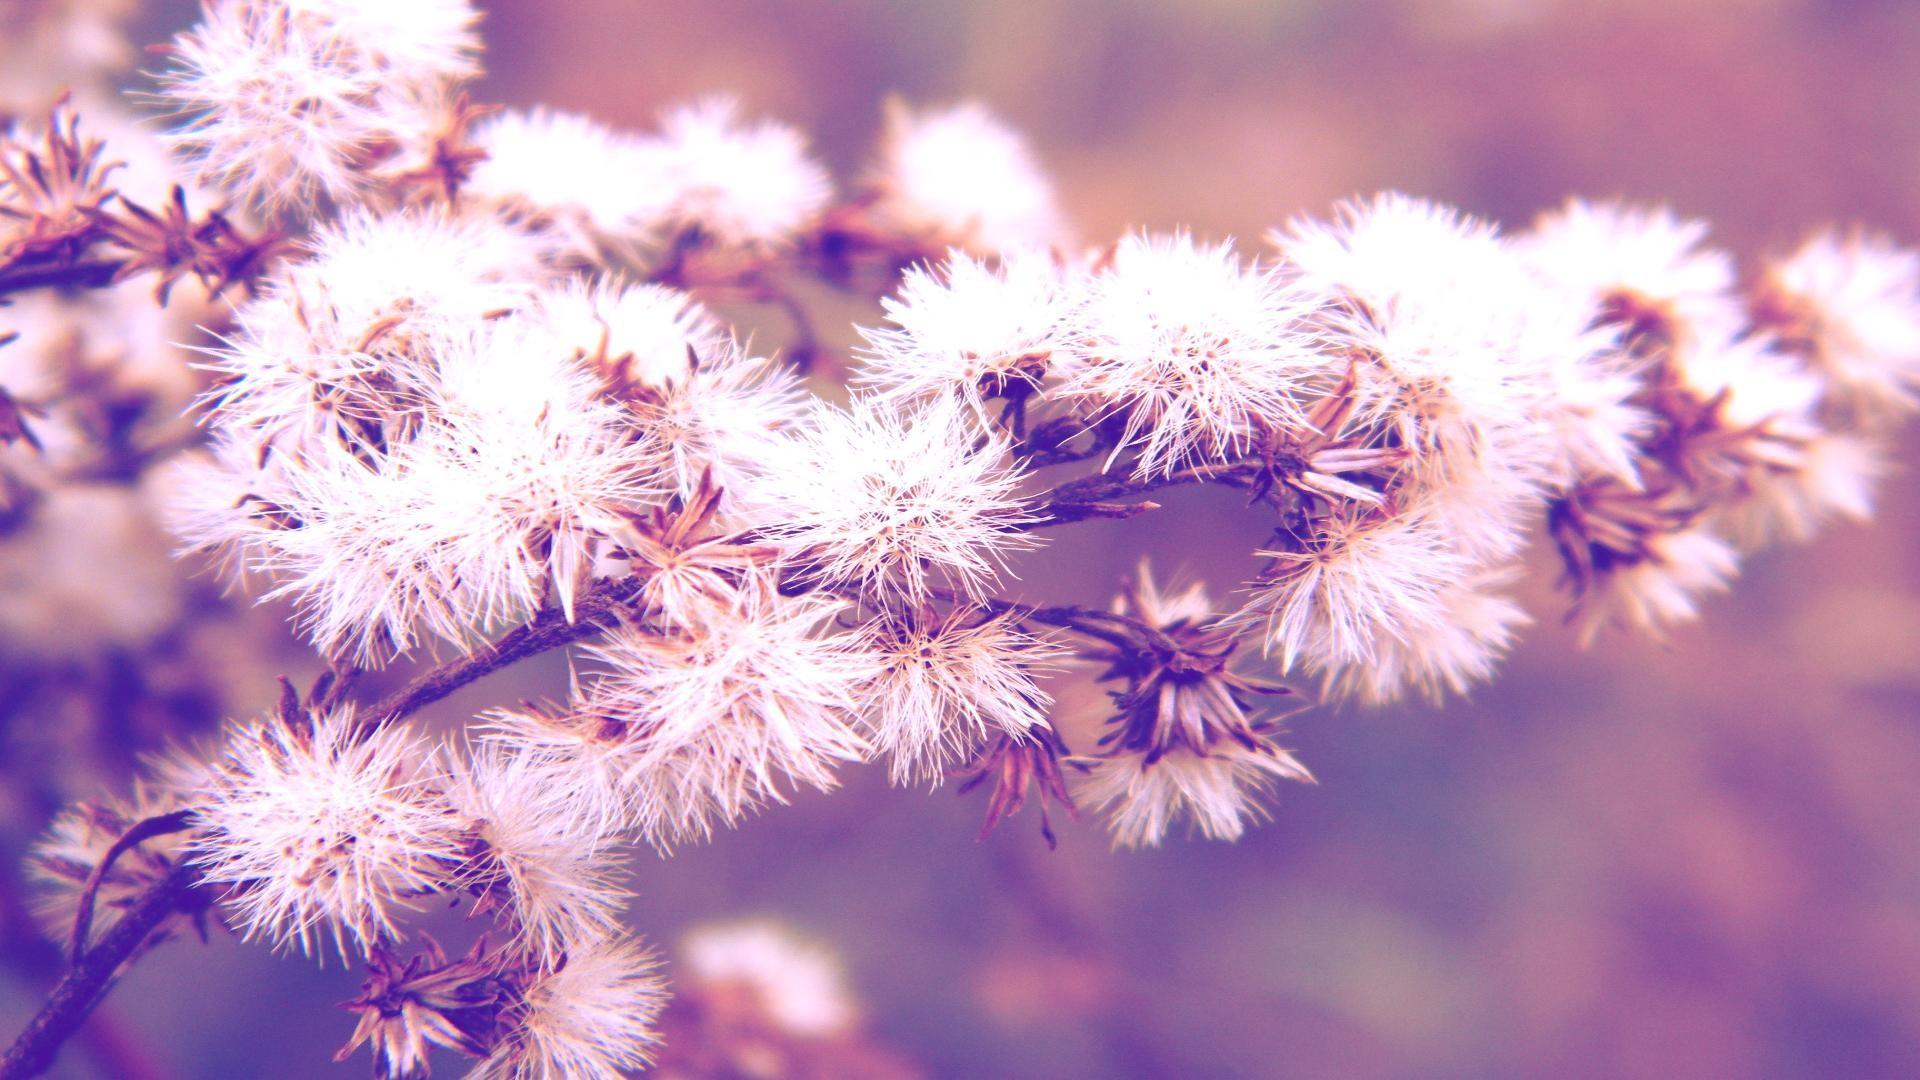 Dandelion background 60 images - Dandelion hd wallpapers 1080p ...